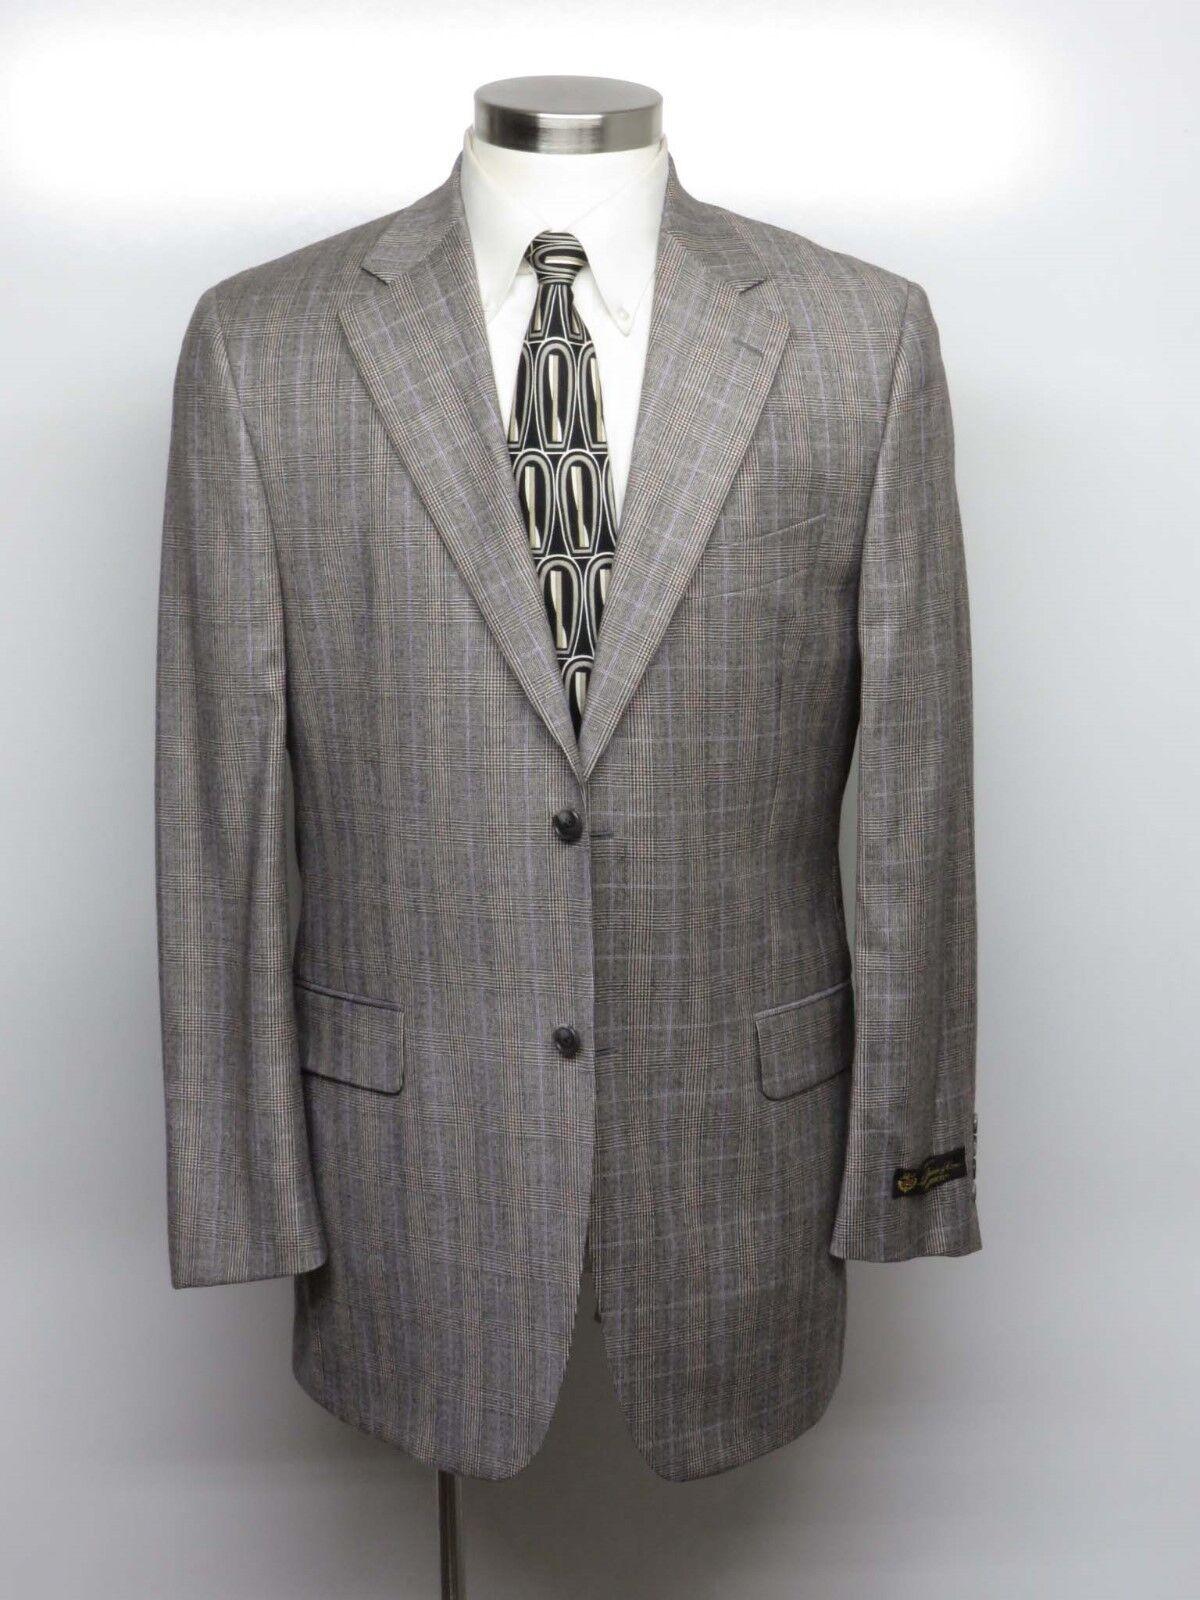 SPENCER STONE CUSTOM Sport Coat 40L Beige Glen Plaid- LORO PIANA ZELANDER - 895